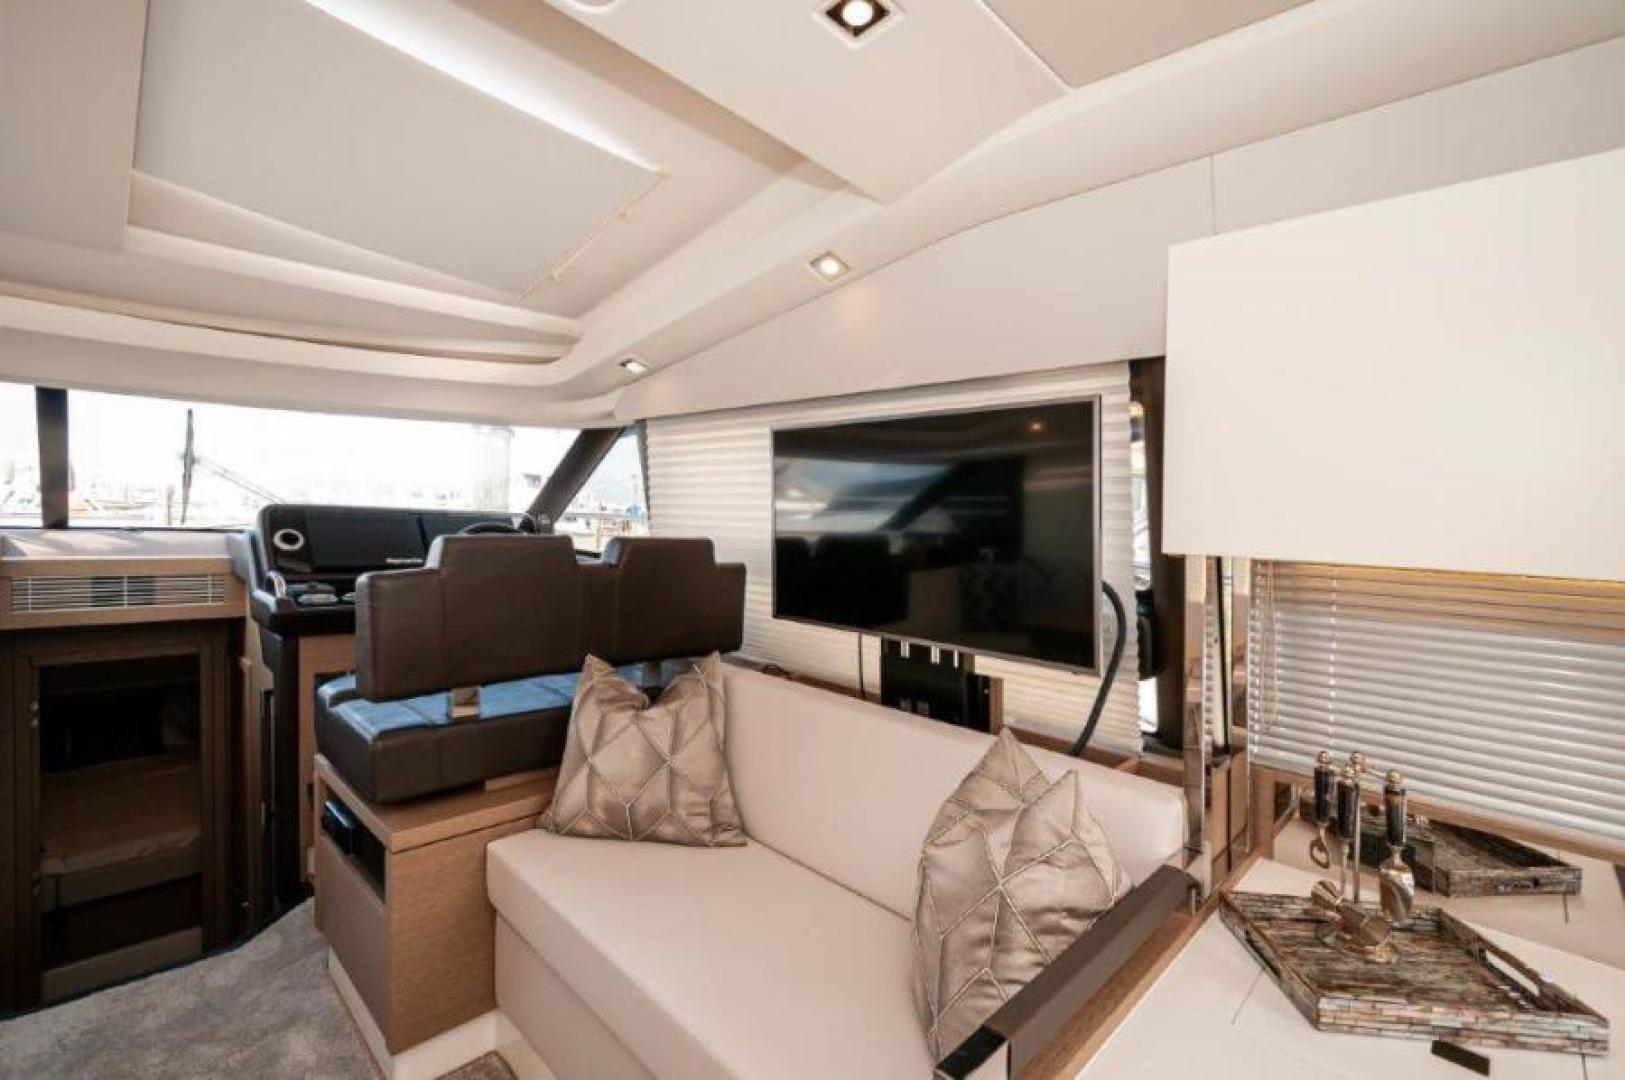 Prestige-460 S 2018-Unforgettable St Petersburg-Florida-United States-2018 Prestige 460 S Yacht  Unforgettable  Salon TV and Seating-1444317   Thumbnail